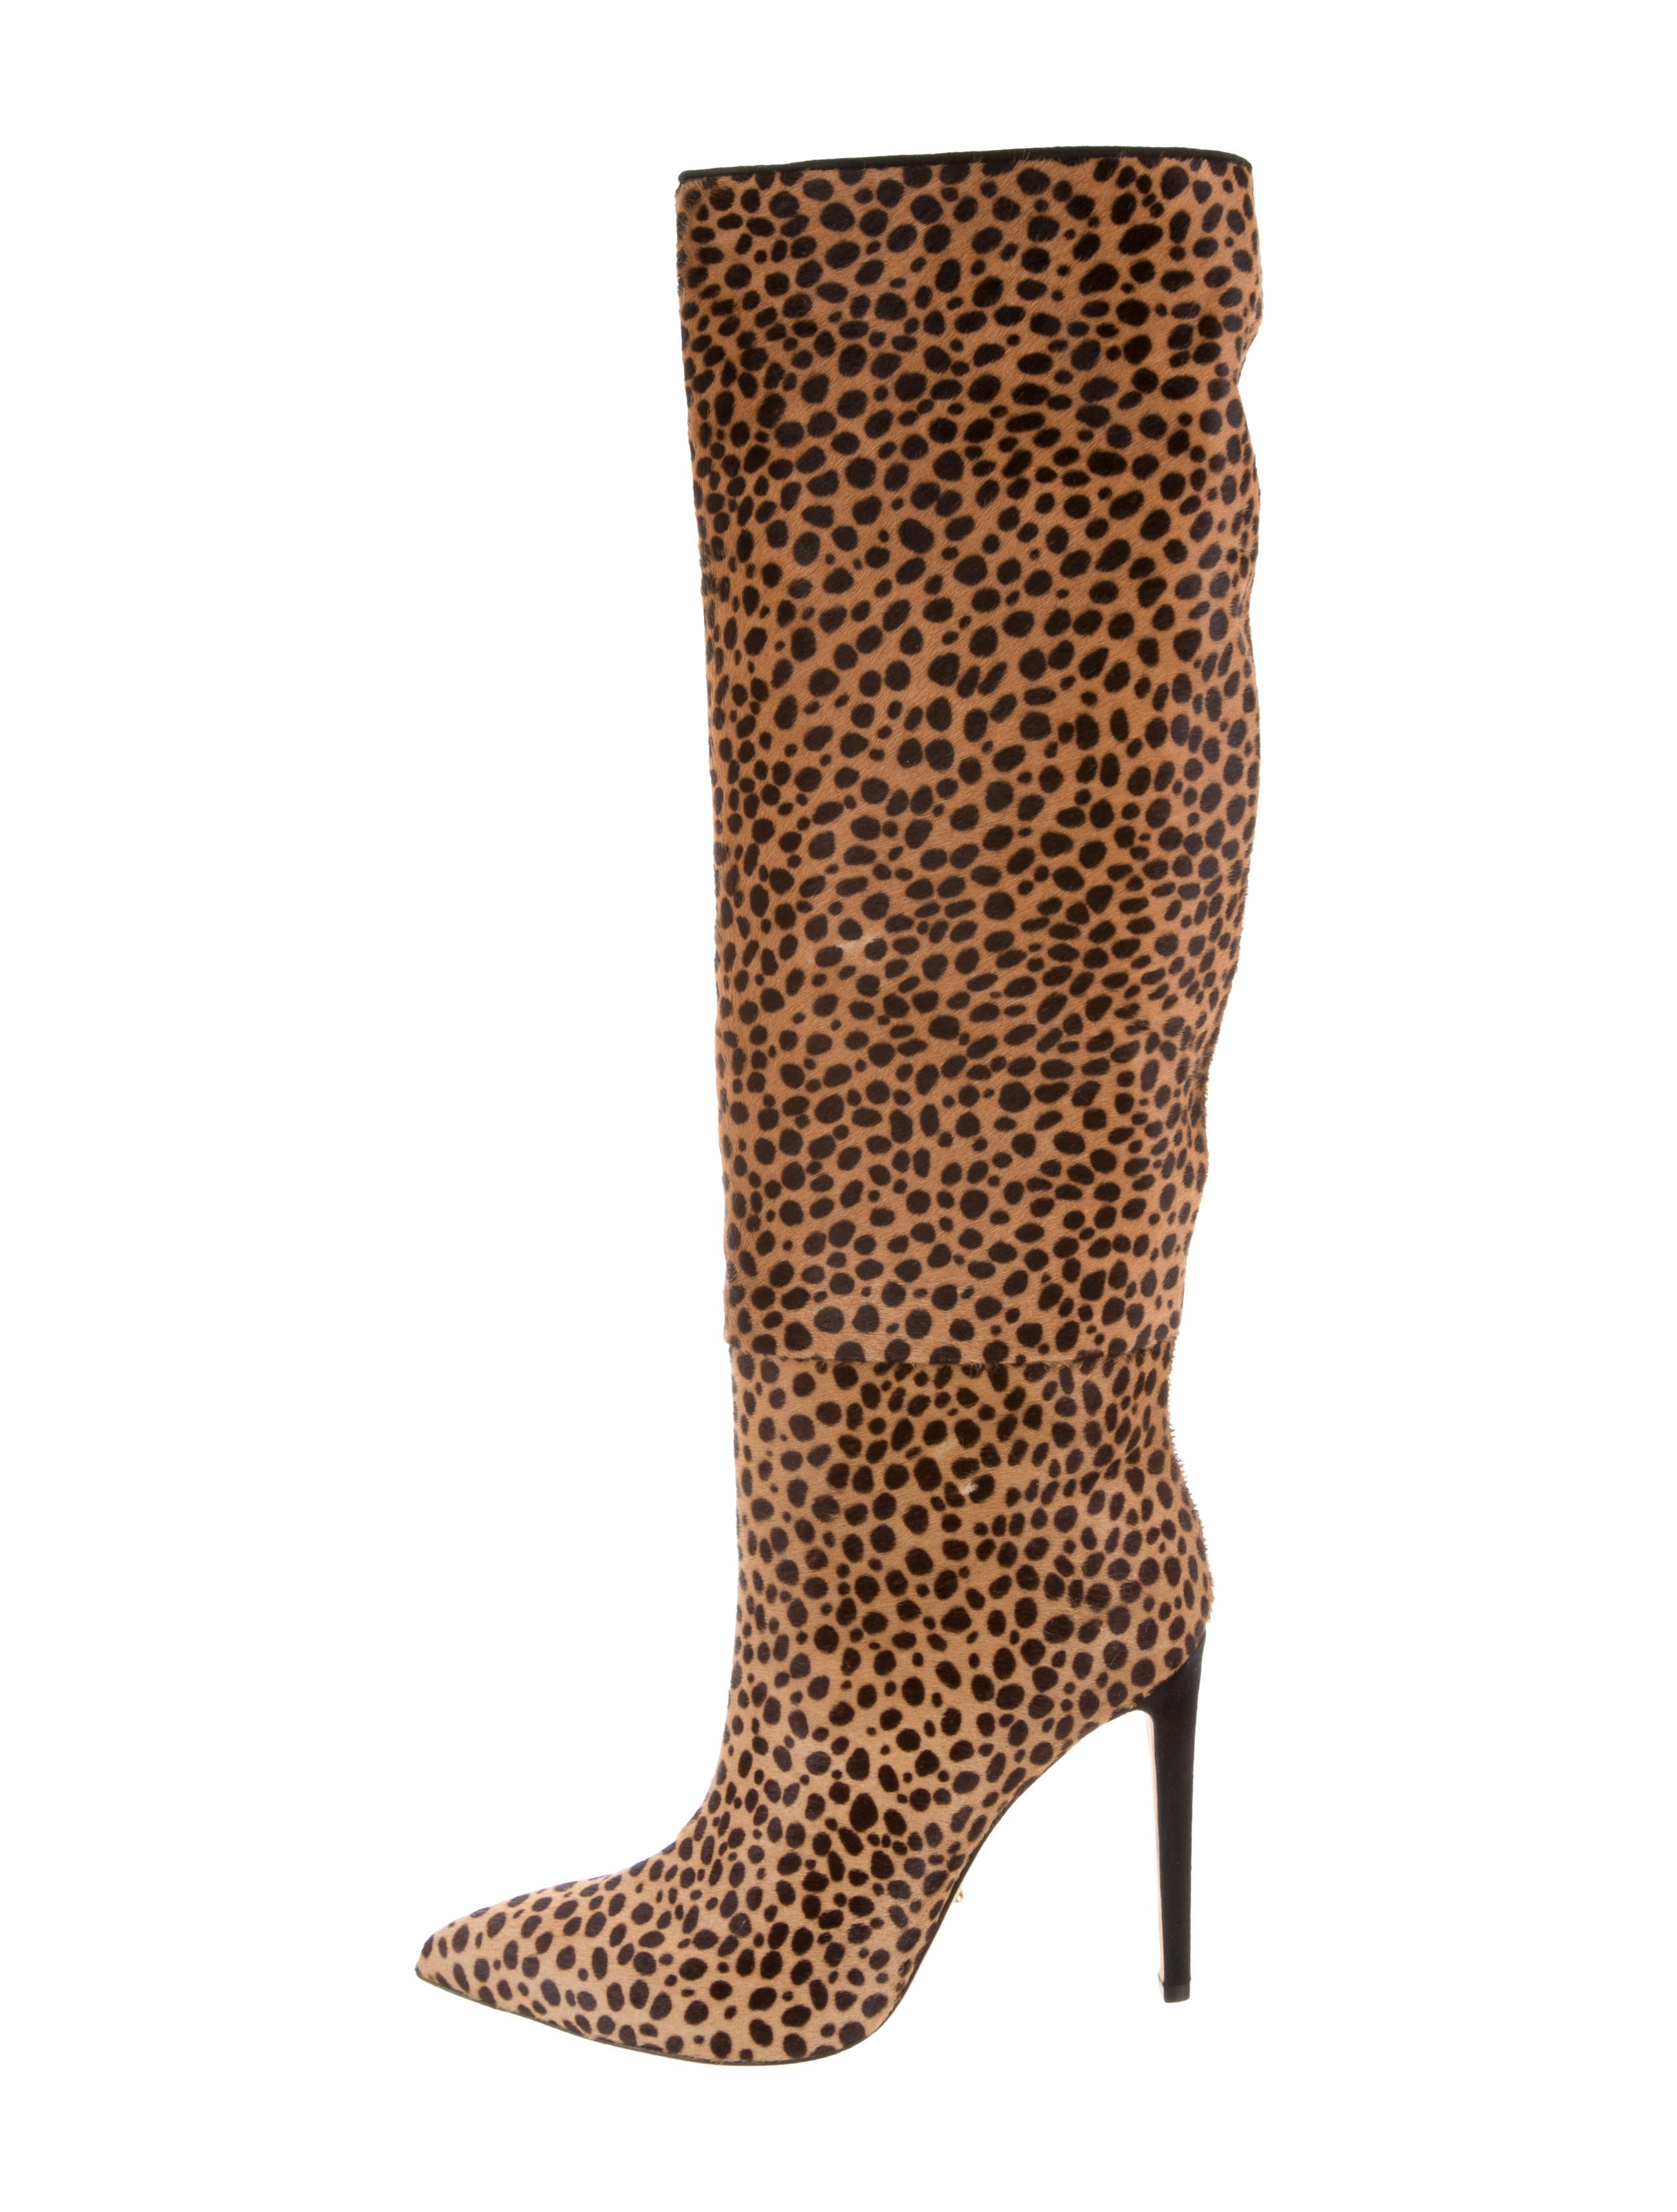 sale amazing price Sergio Rossi Matrix Ponyhair Boots w/ Tags good selling for sale NipVQ6IgXc